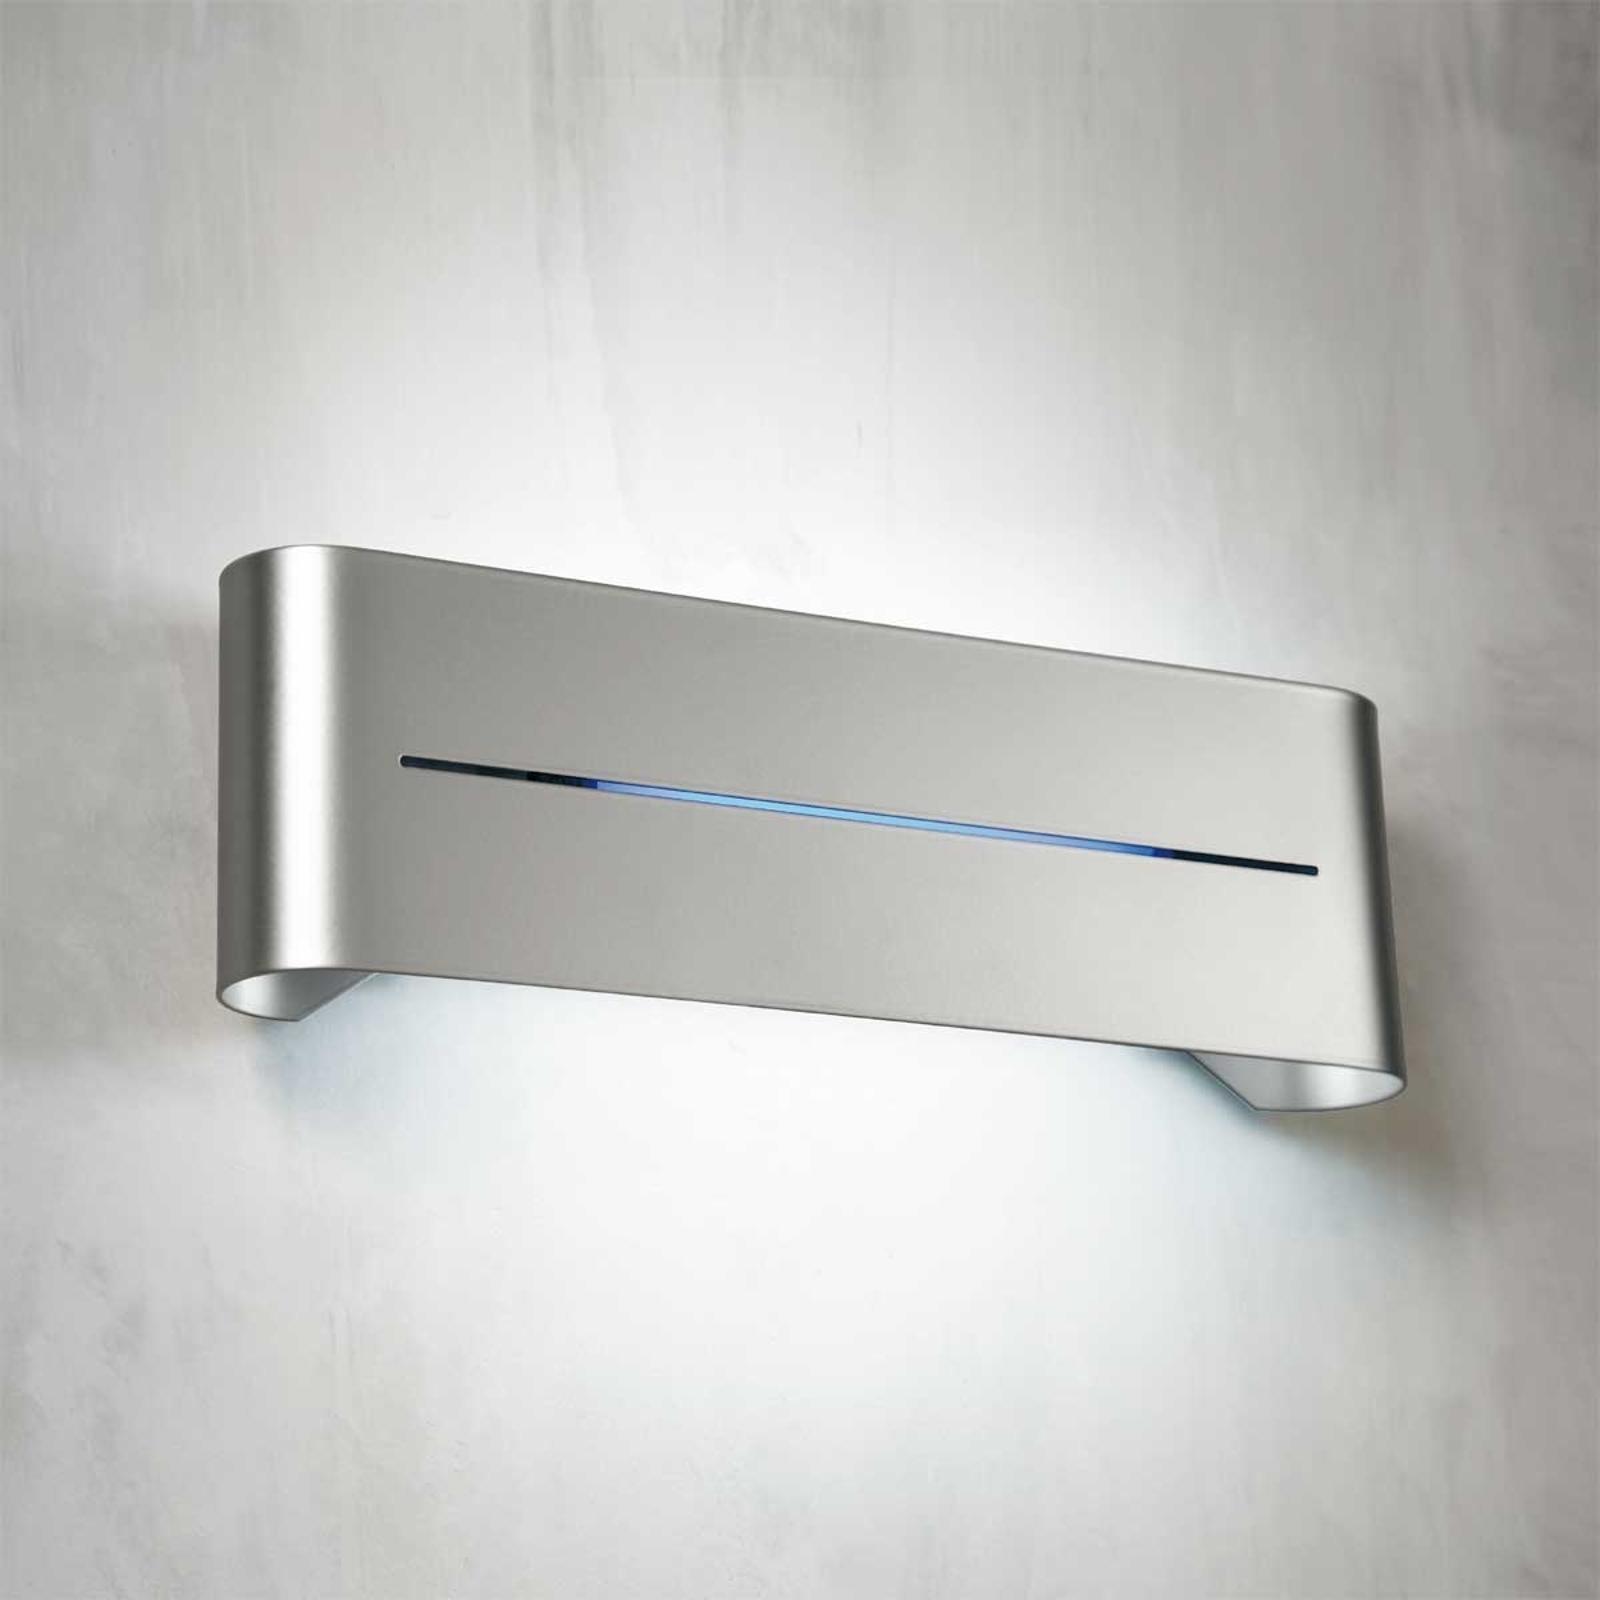 Futuristische wandlamp Limbo, E27, 38 cm